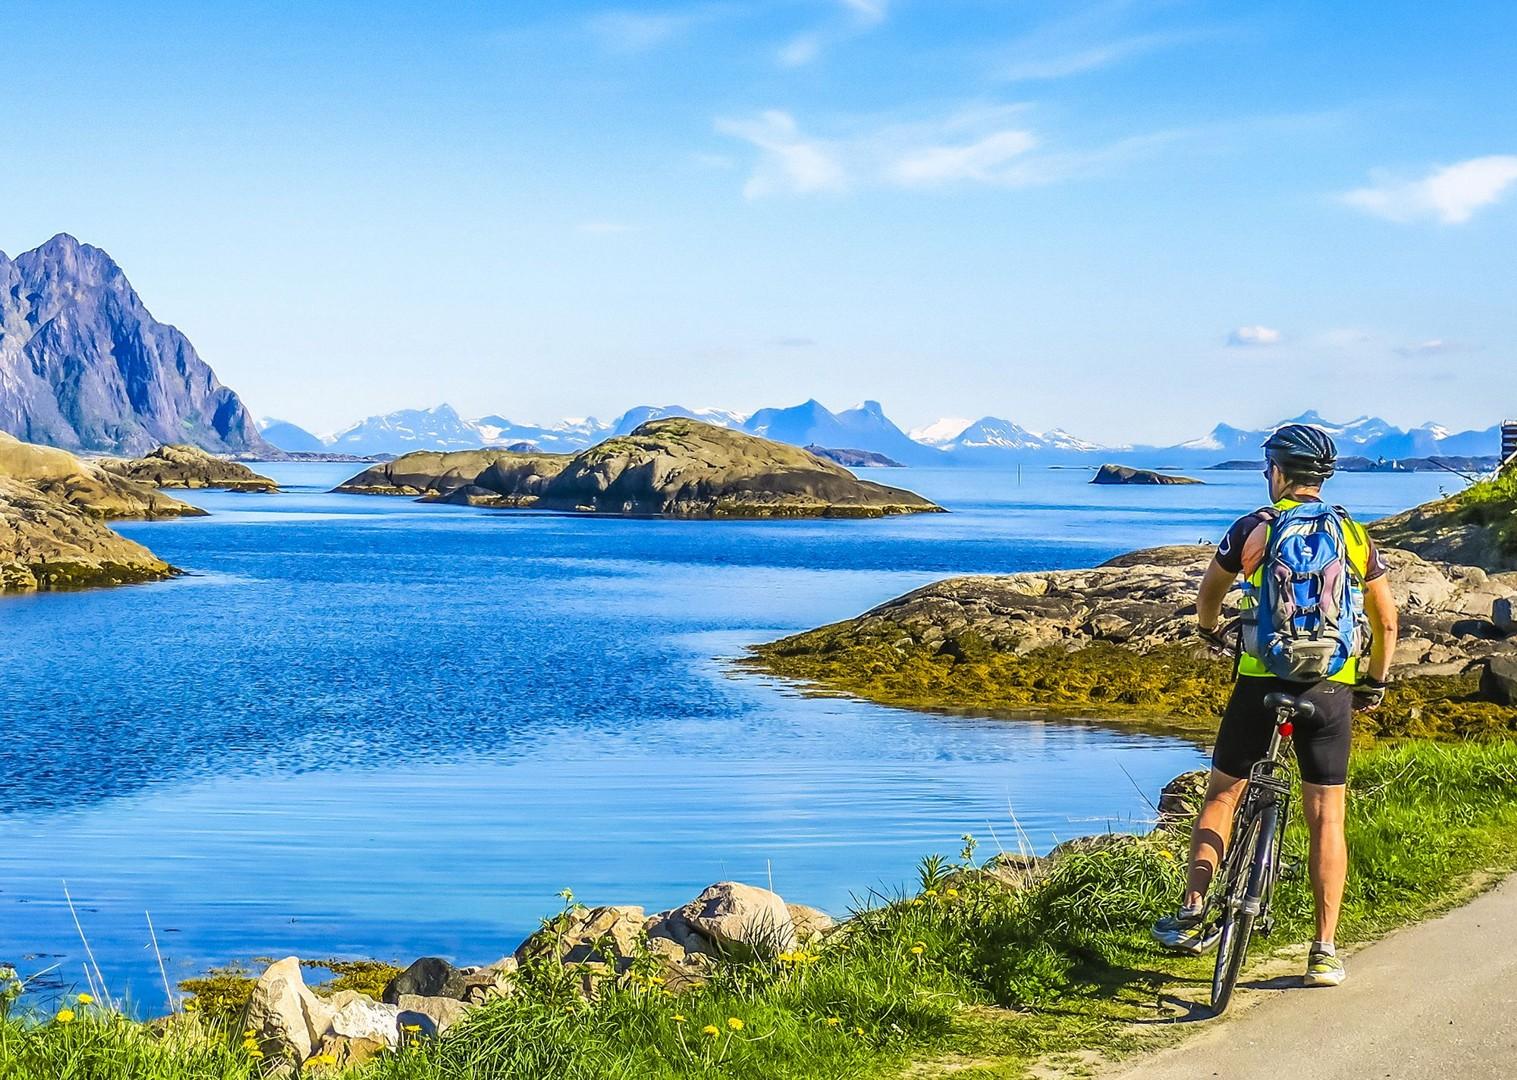 norway-lofoten-islands-cycling-tour-self-guided.jpg - Norway - Lofoten Islands - Self-Guided Leisure Cycling Holiday - Leisure Cycling